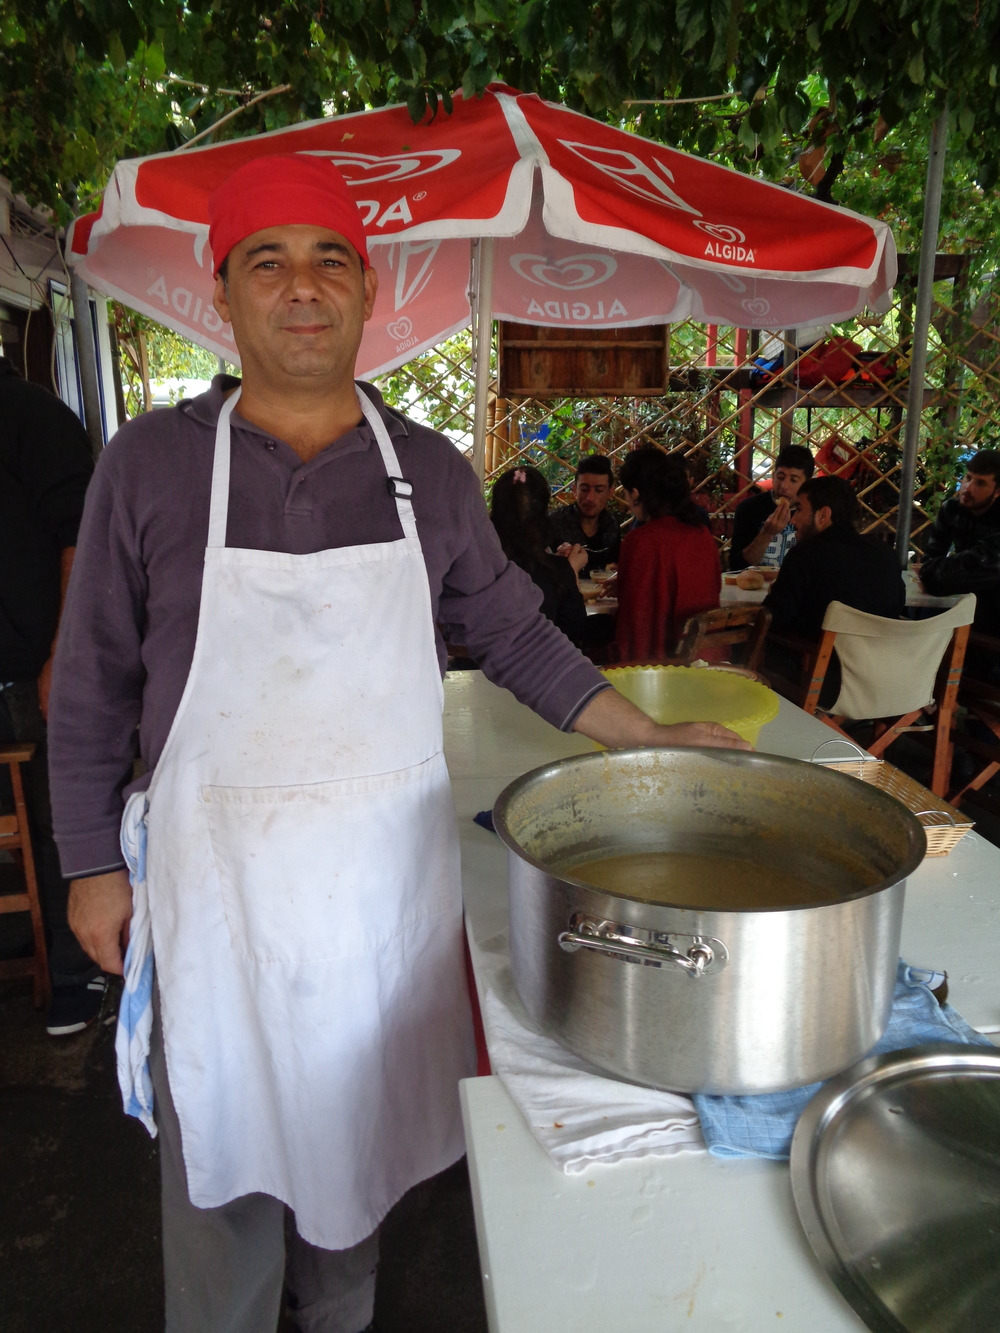 Monika's Team Chef